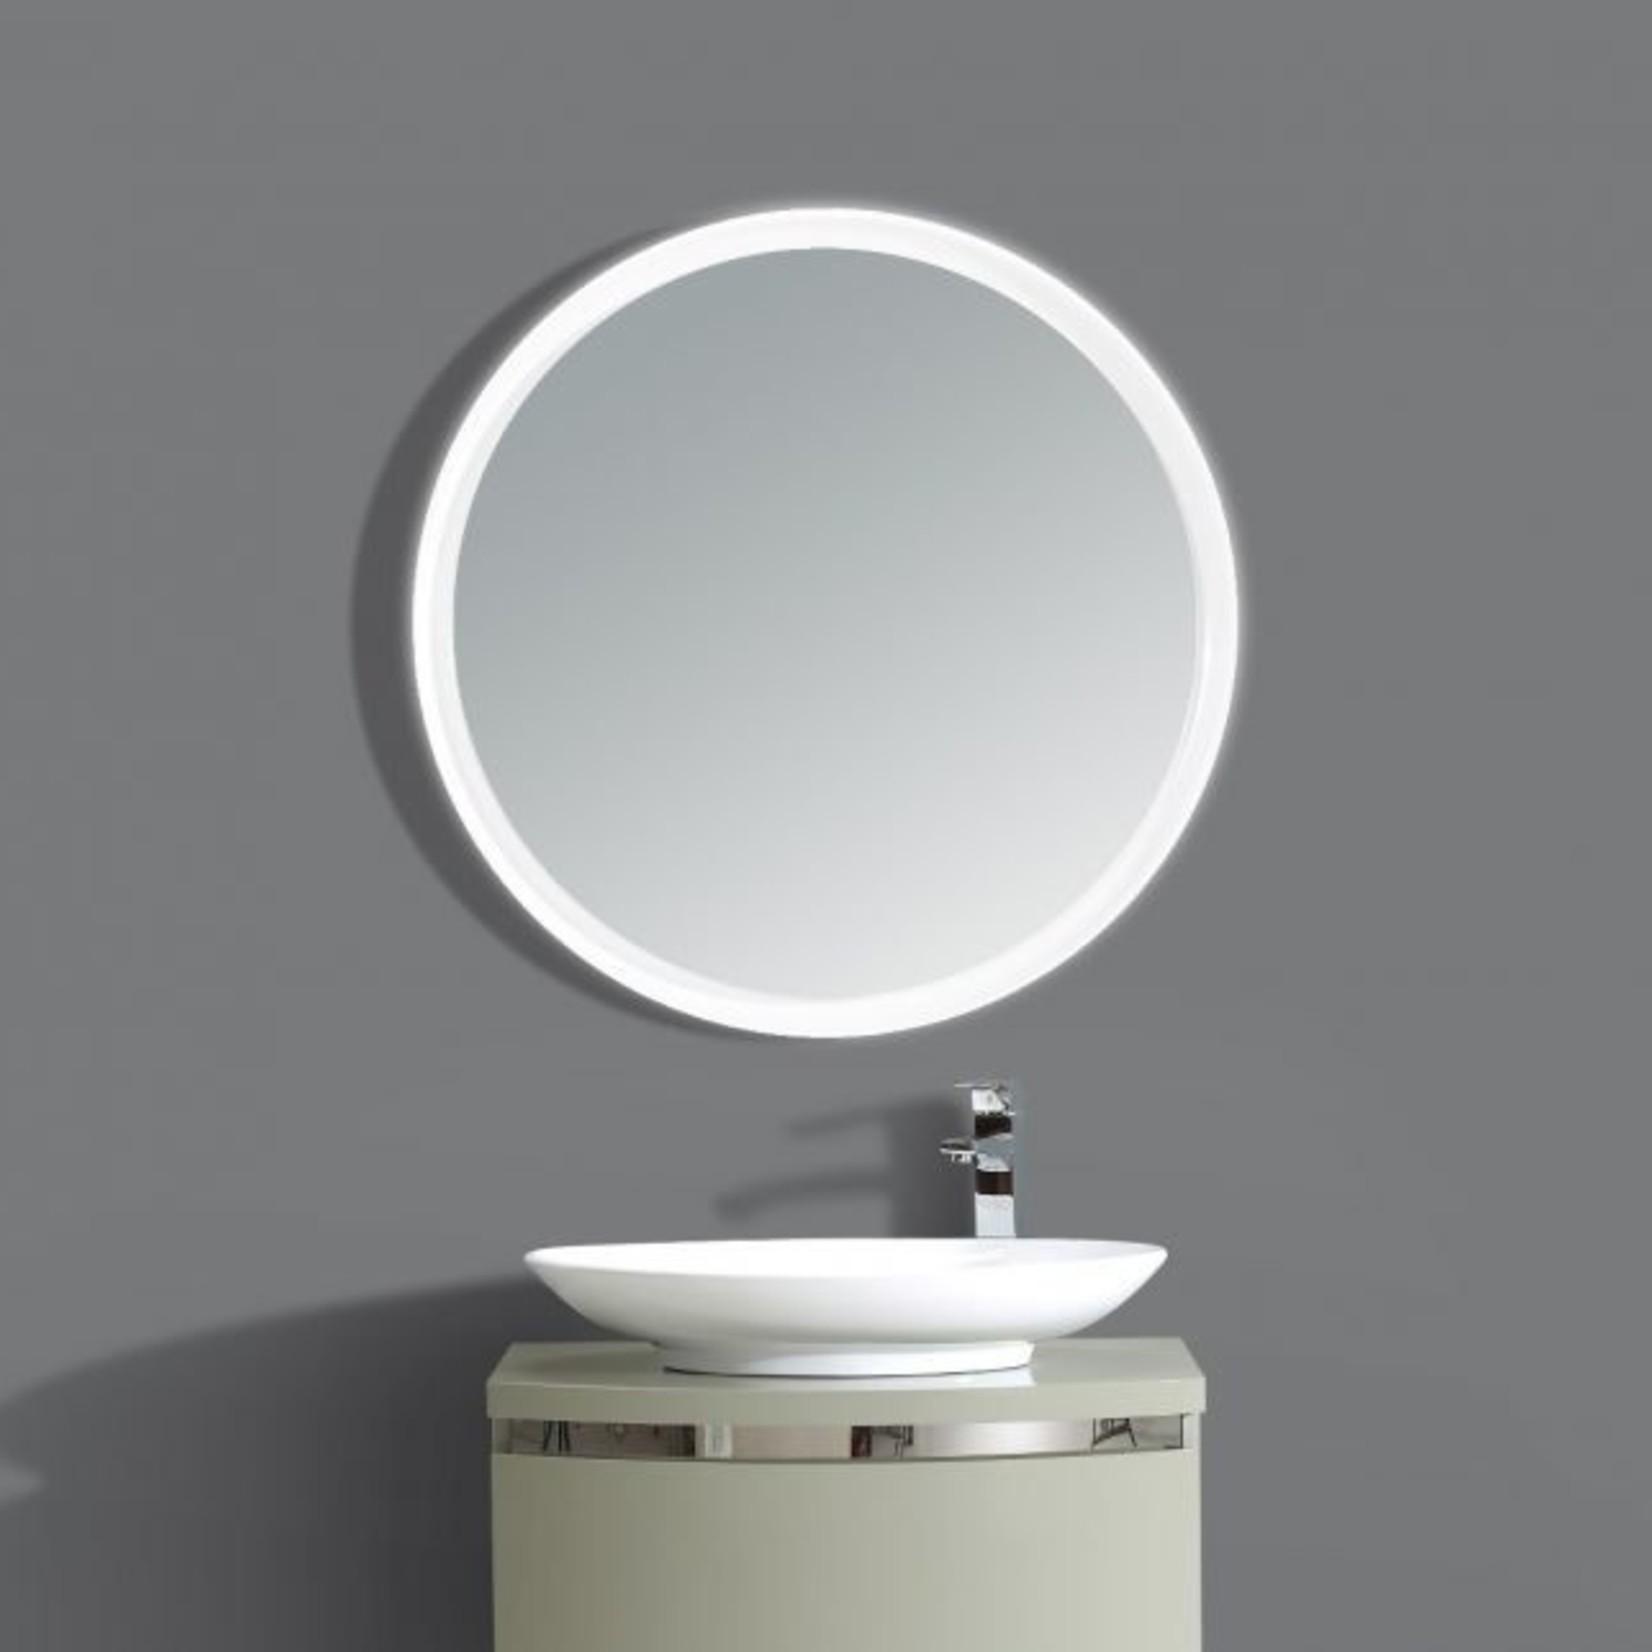 Miroir au led 31'' Aries Ove